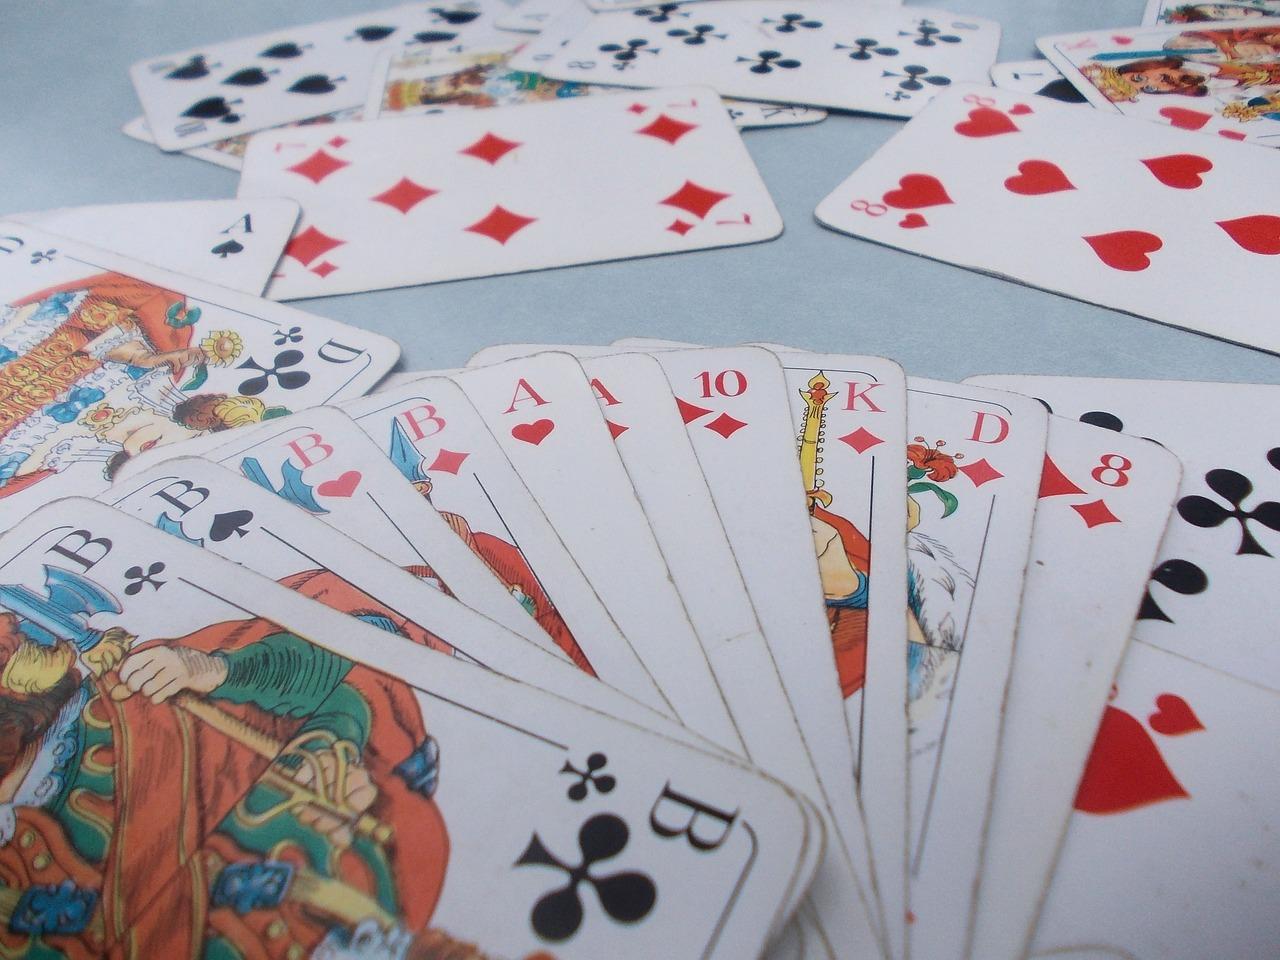 Herzblatt Spielregeln